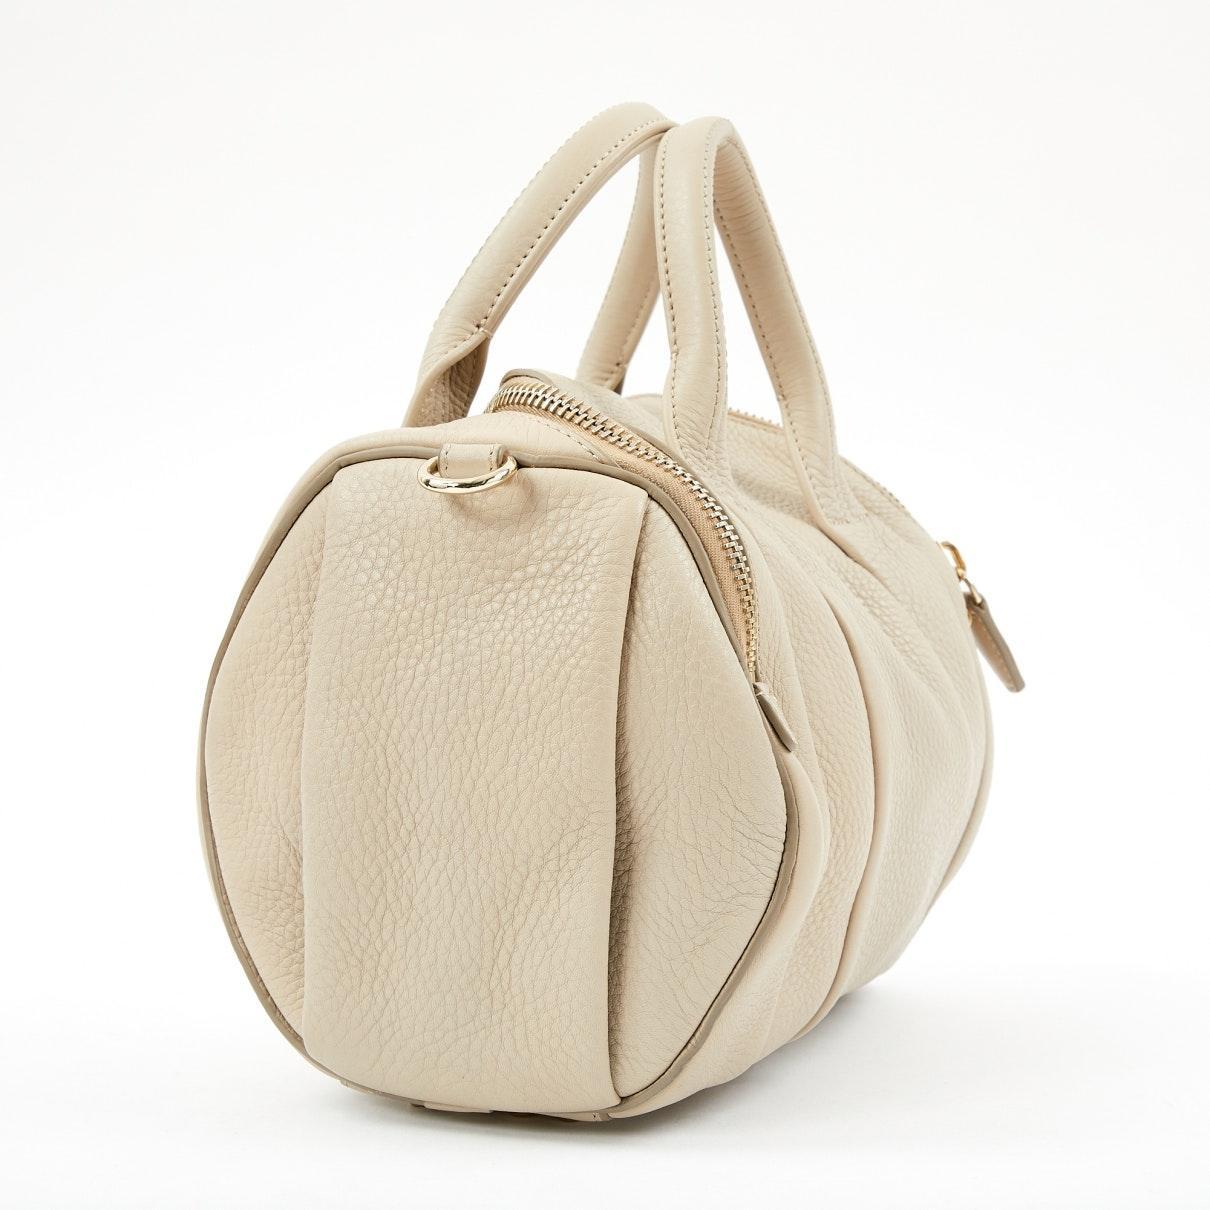 Alexander Wang Leder Leder Handtaschen in Natur bjmij